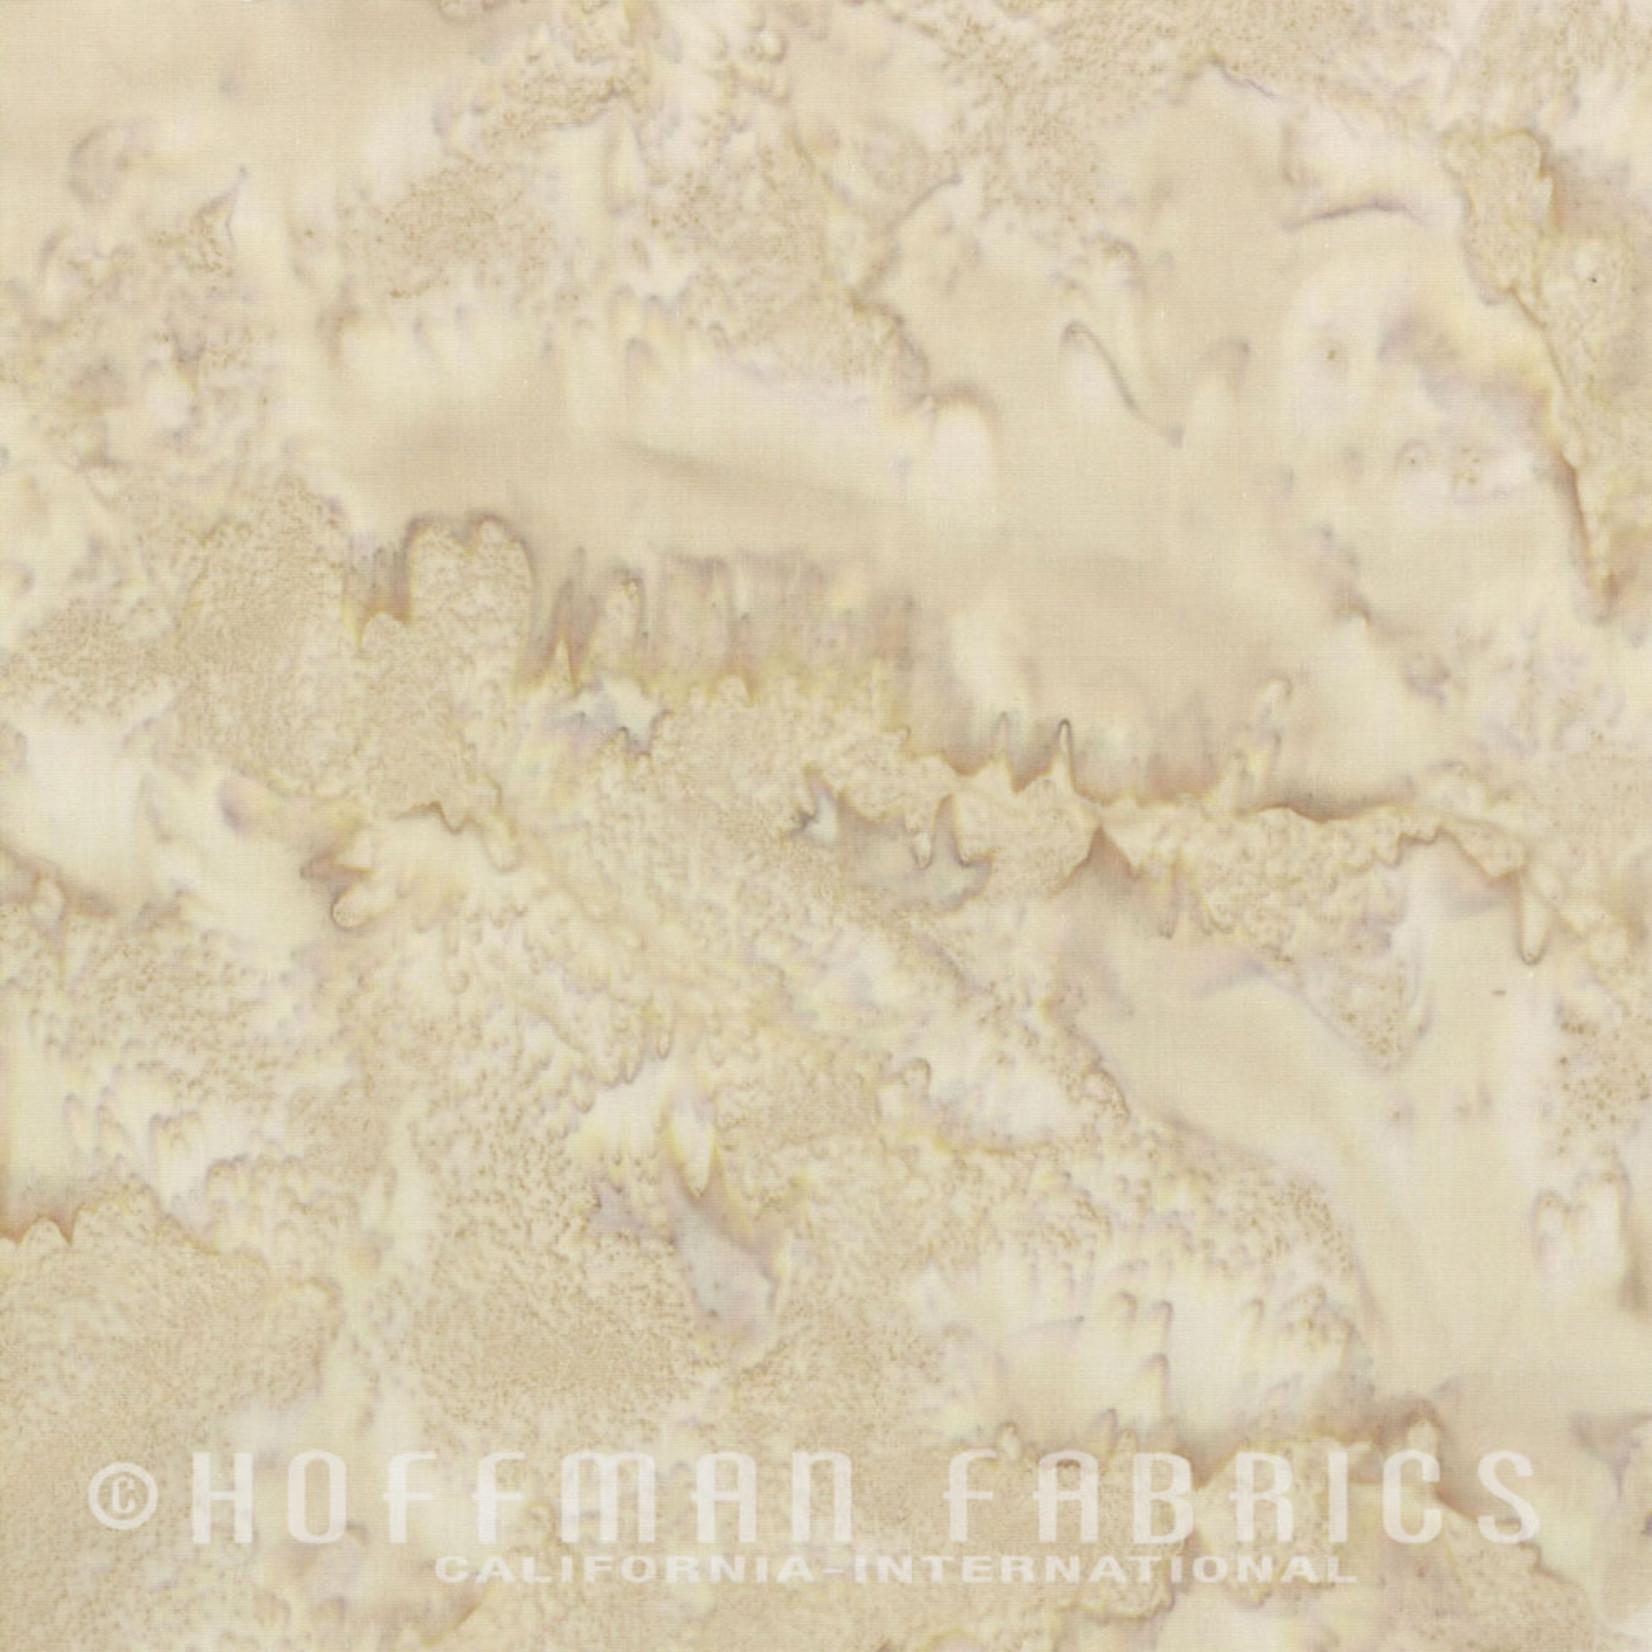 Hoffman Fabrics Watercolors 1895 - 485 Funnel Cake